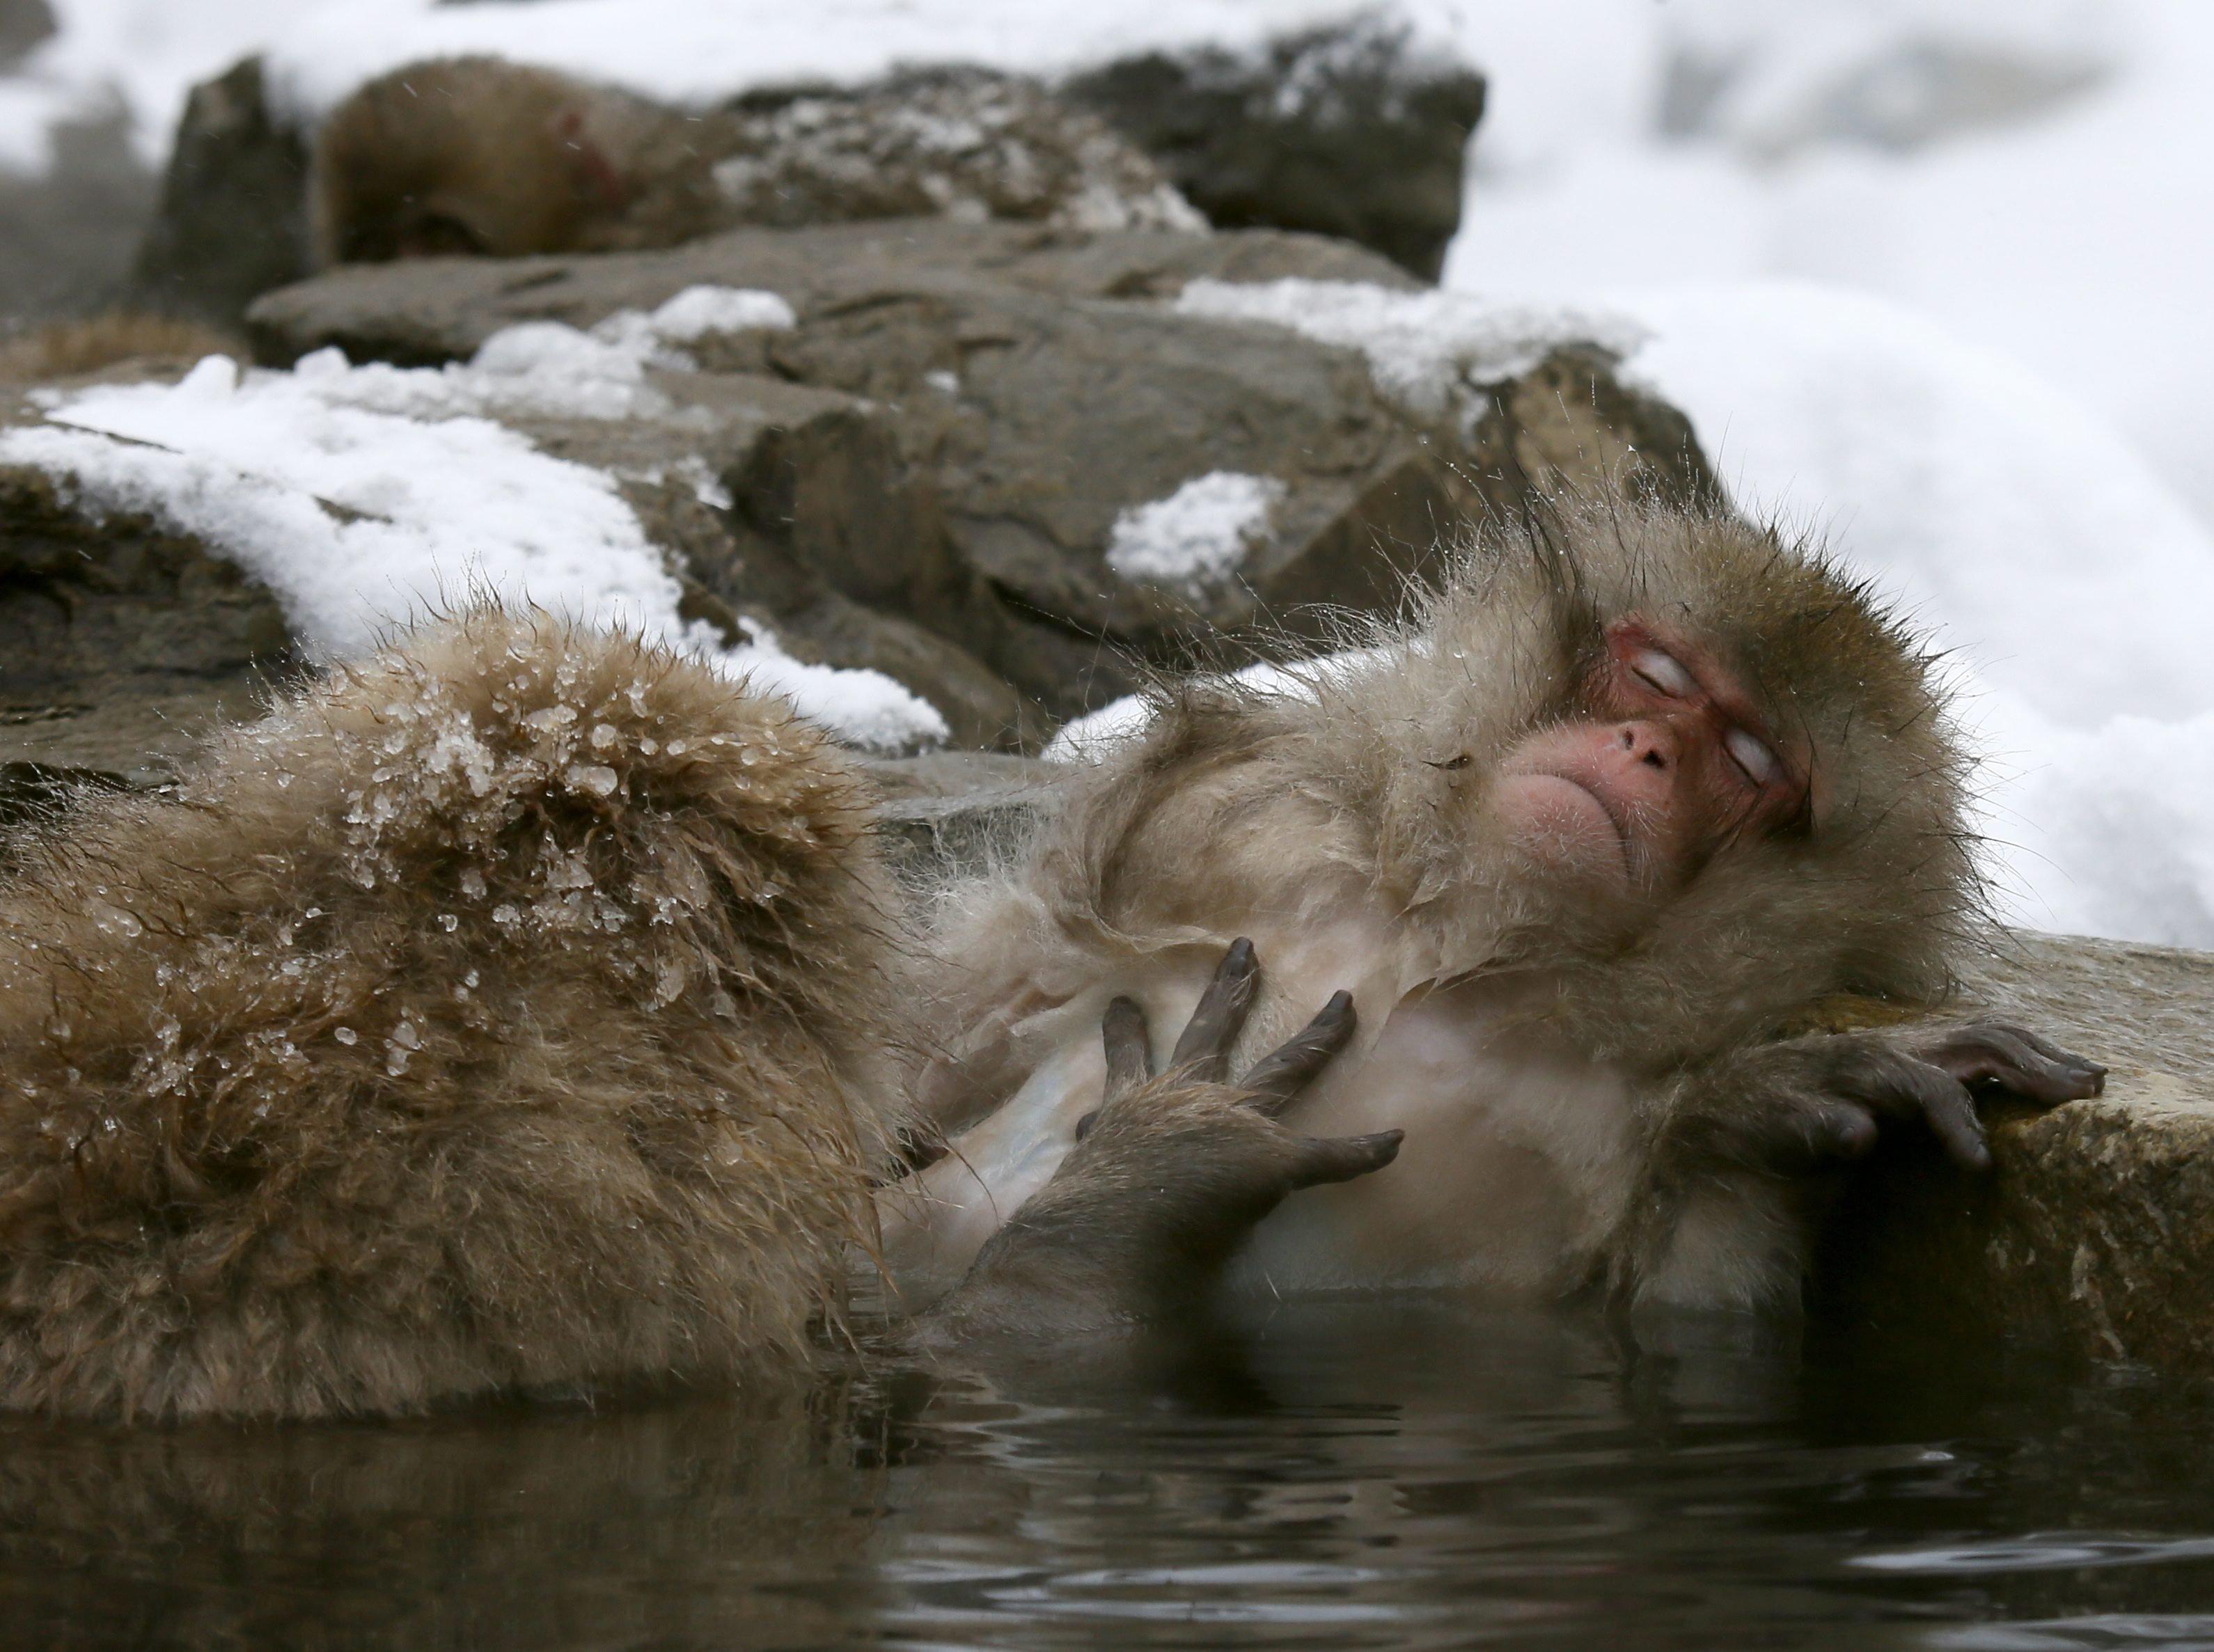 Japanese Macaque monkeys soak in the warmth of mountain hotsprings at Jigokudani Monkey Park, in Yamanouchi, central Japan, Jan. 19, 2014.